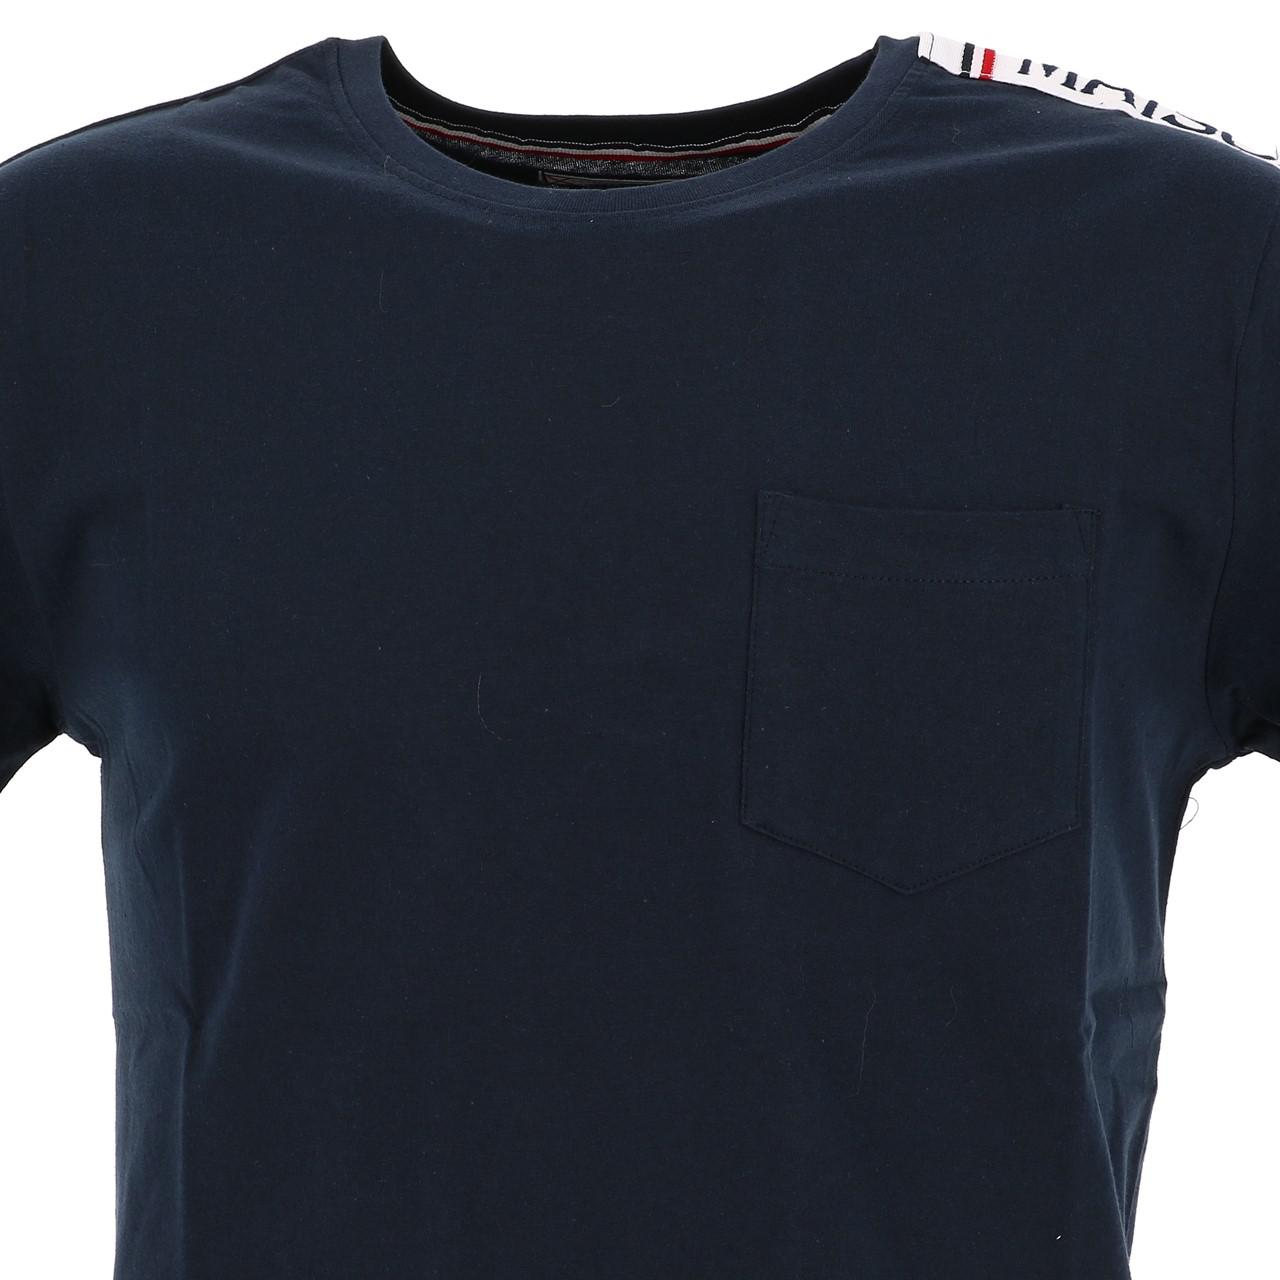 Short-Sleeve-T-Shirt-La-Maison-Blaggio-Metili-Navy-Mc-Tee-Blue-27343-New thumbnail 2